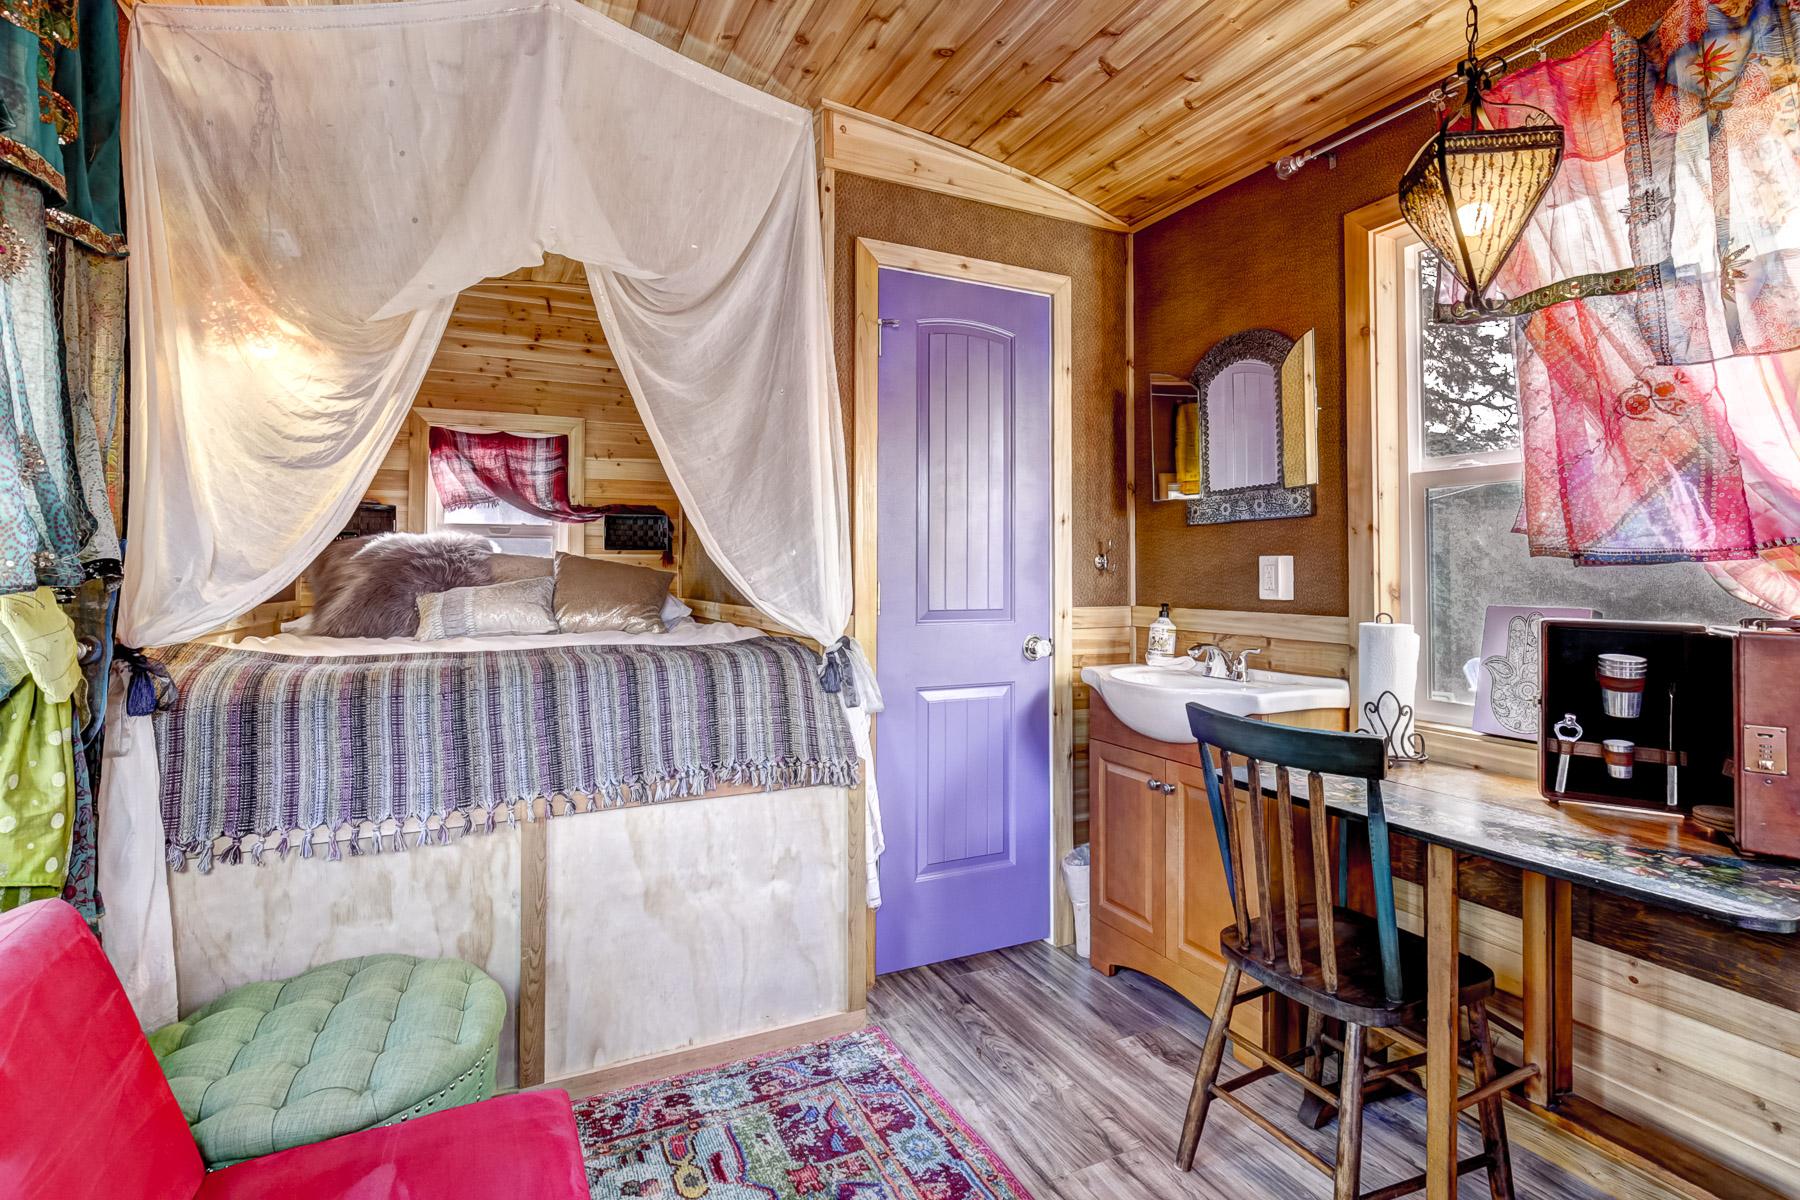 Bed canopy gypsy - Gypsy Wagon Gypsy Wagon Gypsy Wagon